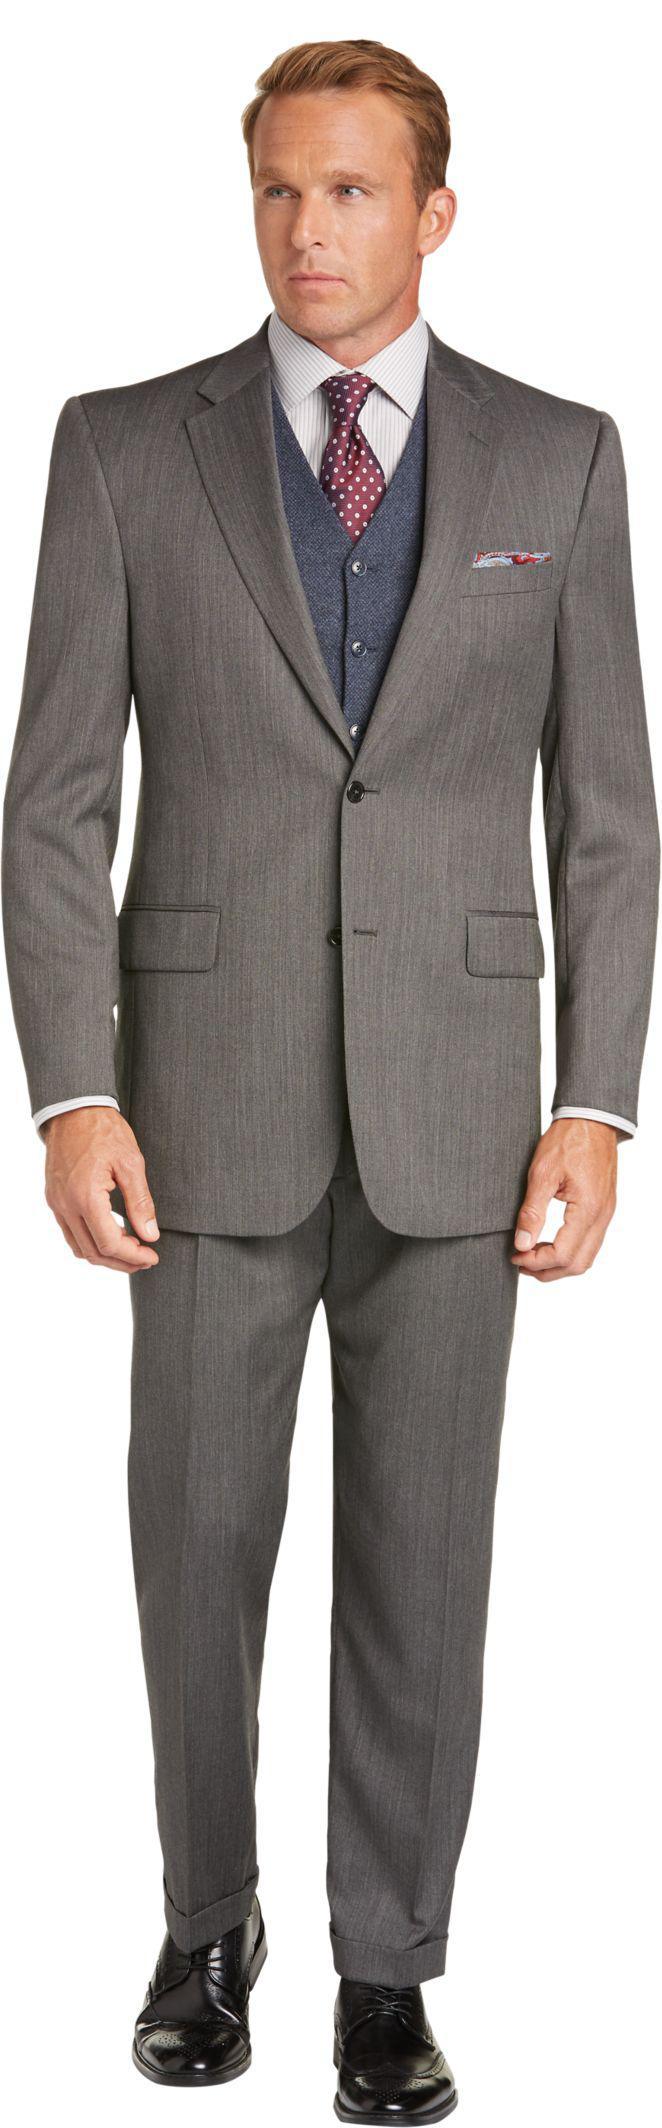 jos a bank suits